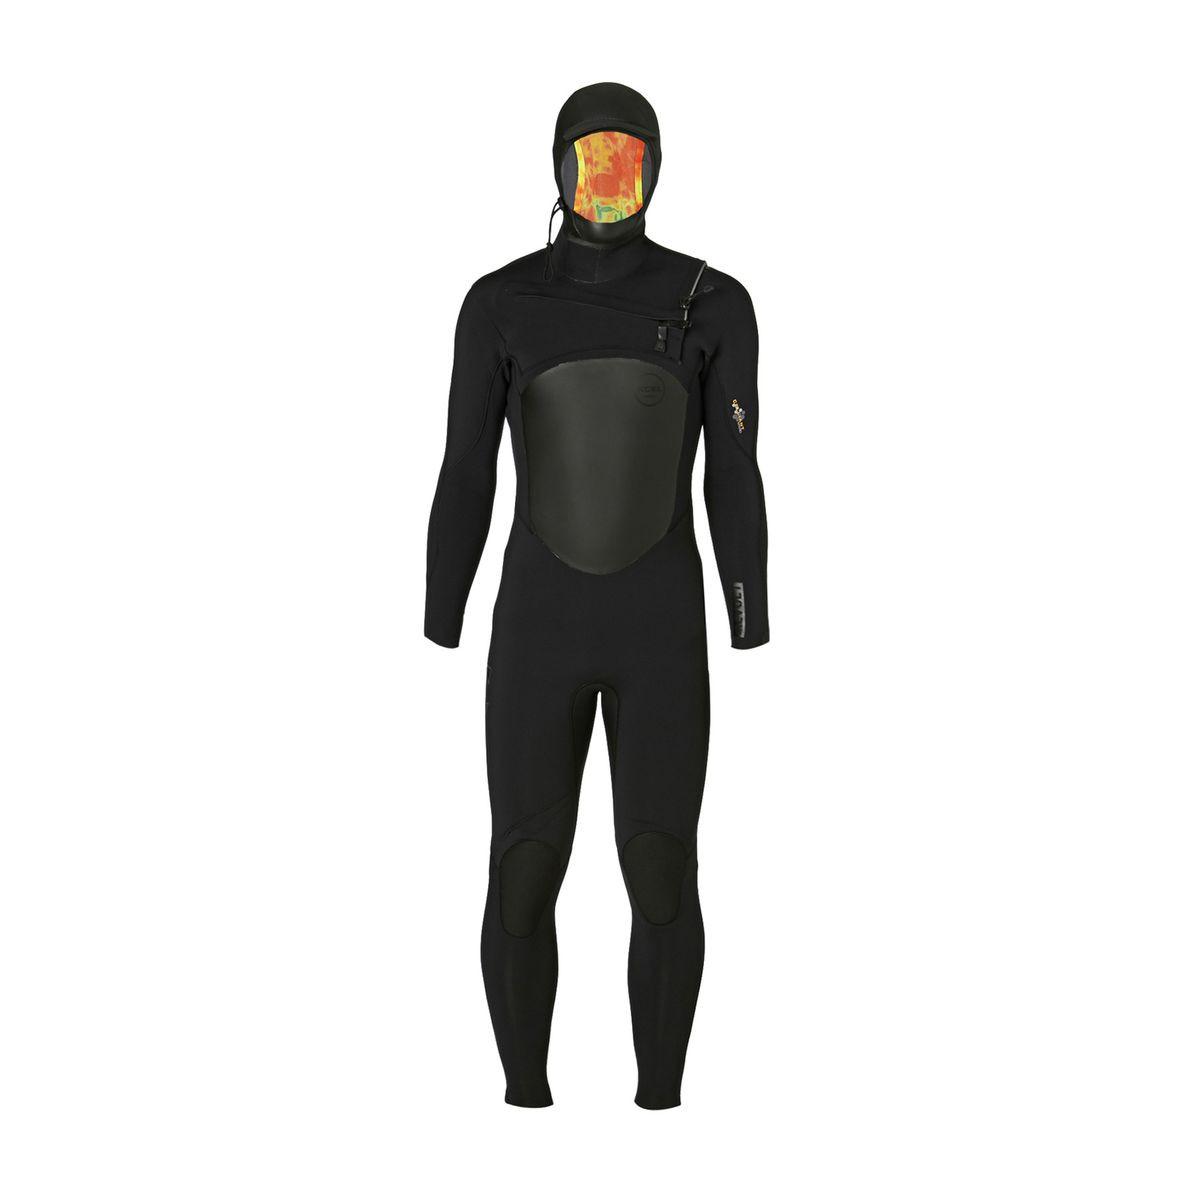 Xcel Revolt 5/4/3mm Hooded X2 2017 Chest Zip Wetsuit - Black